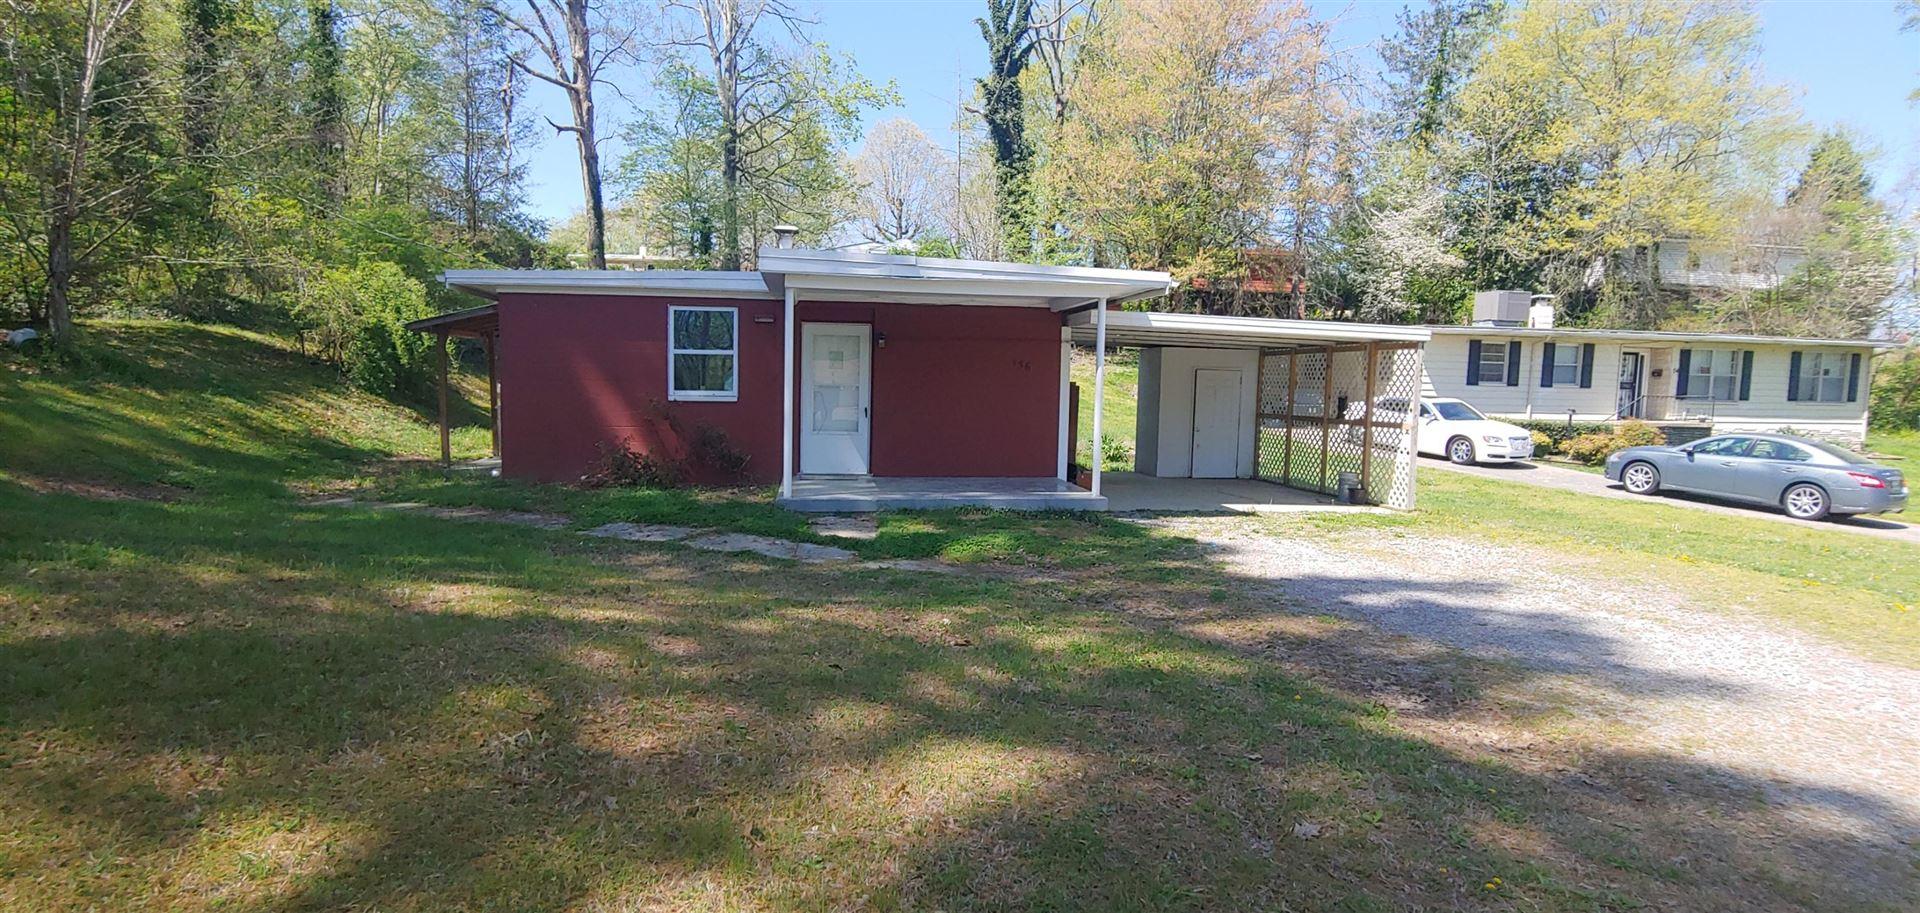 Photo of 156 Northwestern Ave, Oak Ridge, TN 37830 (MLS # 1148913)